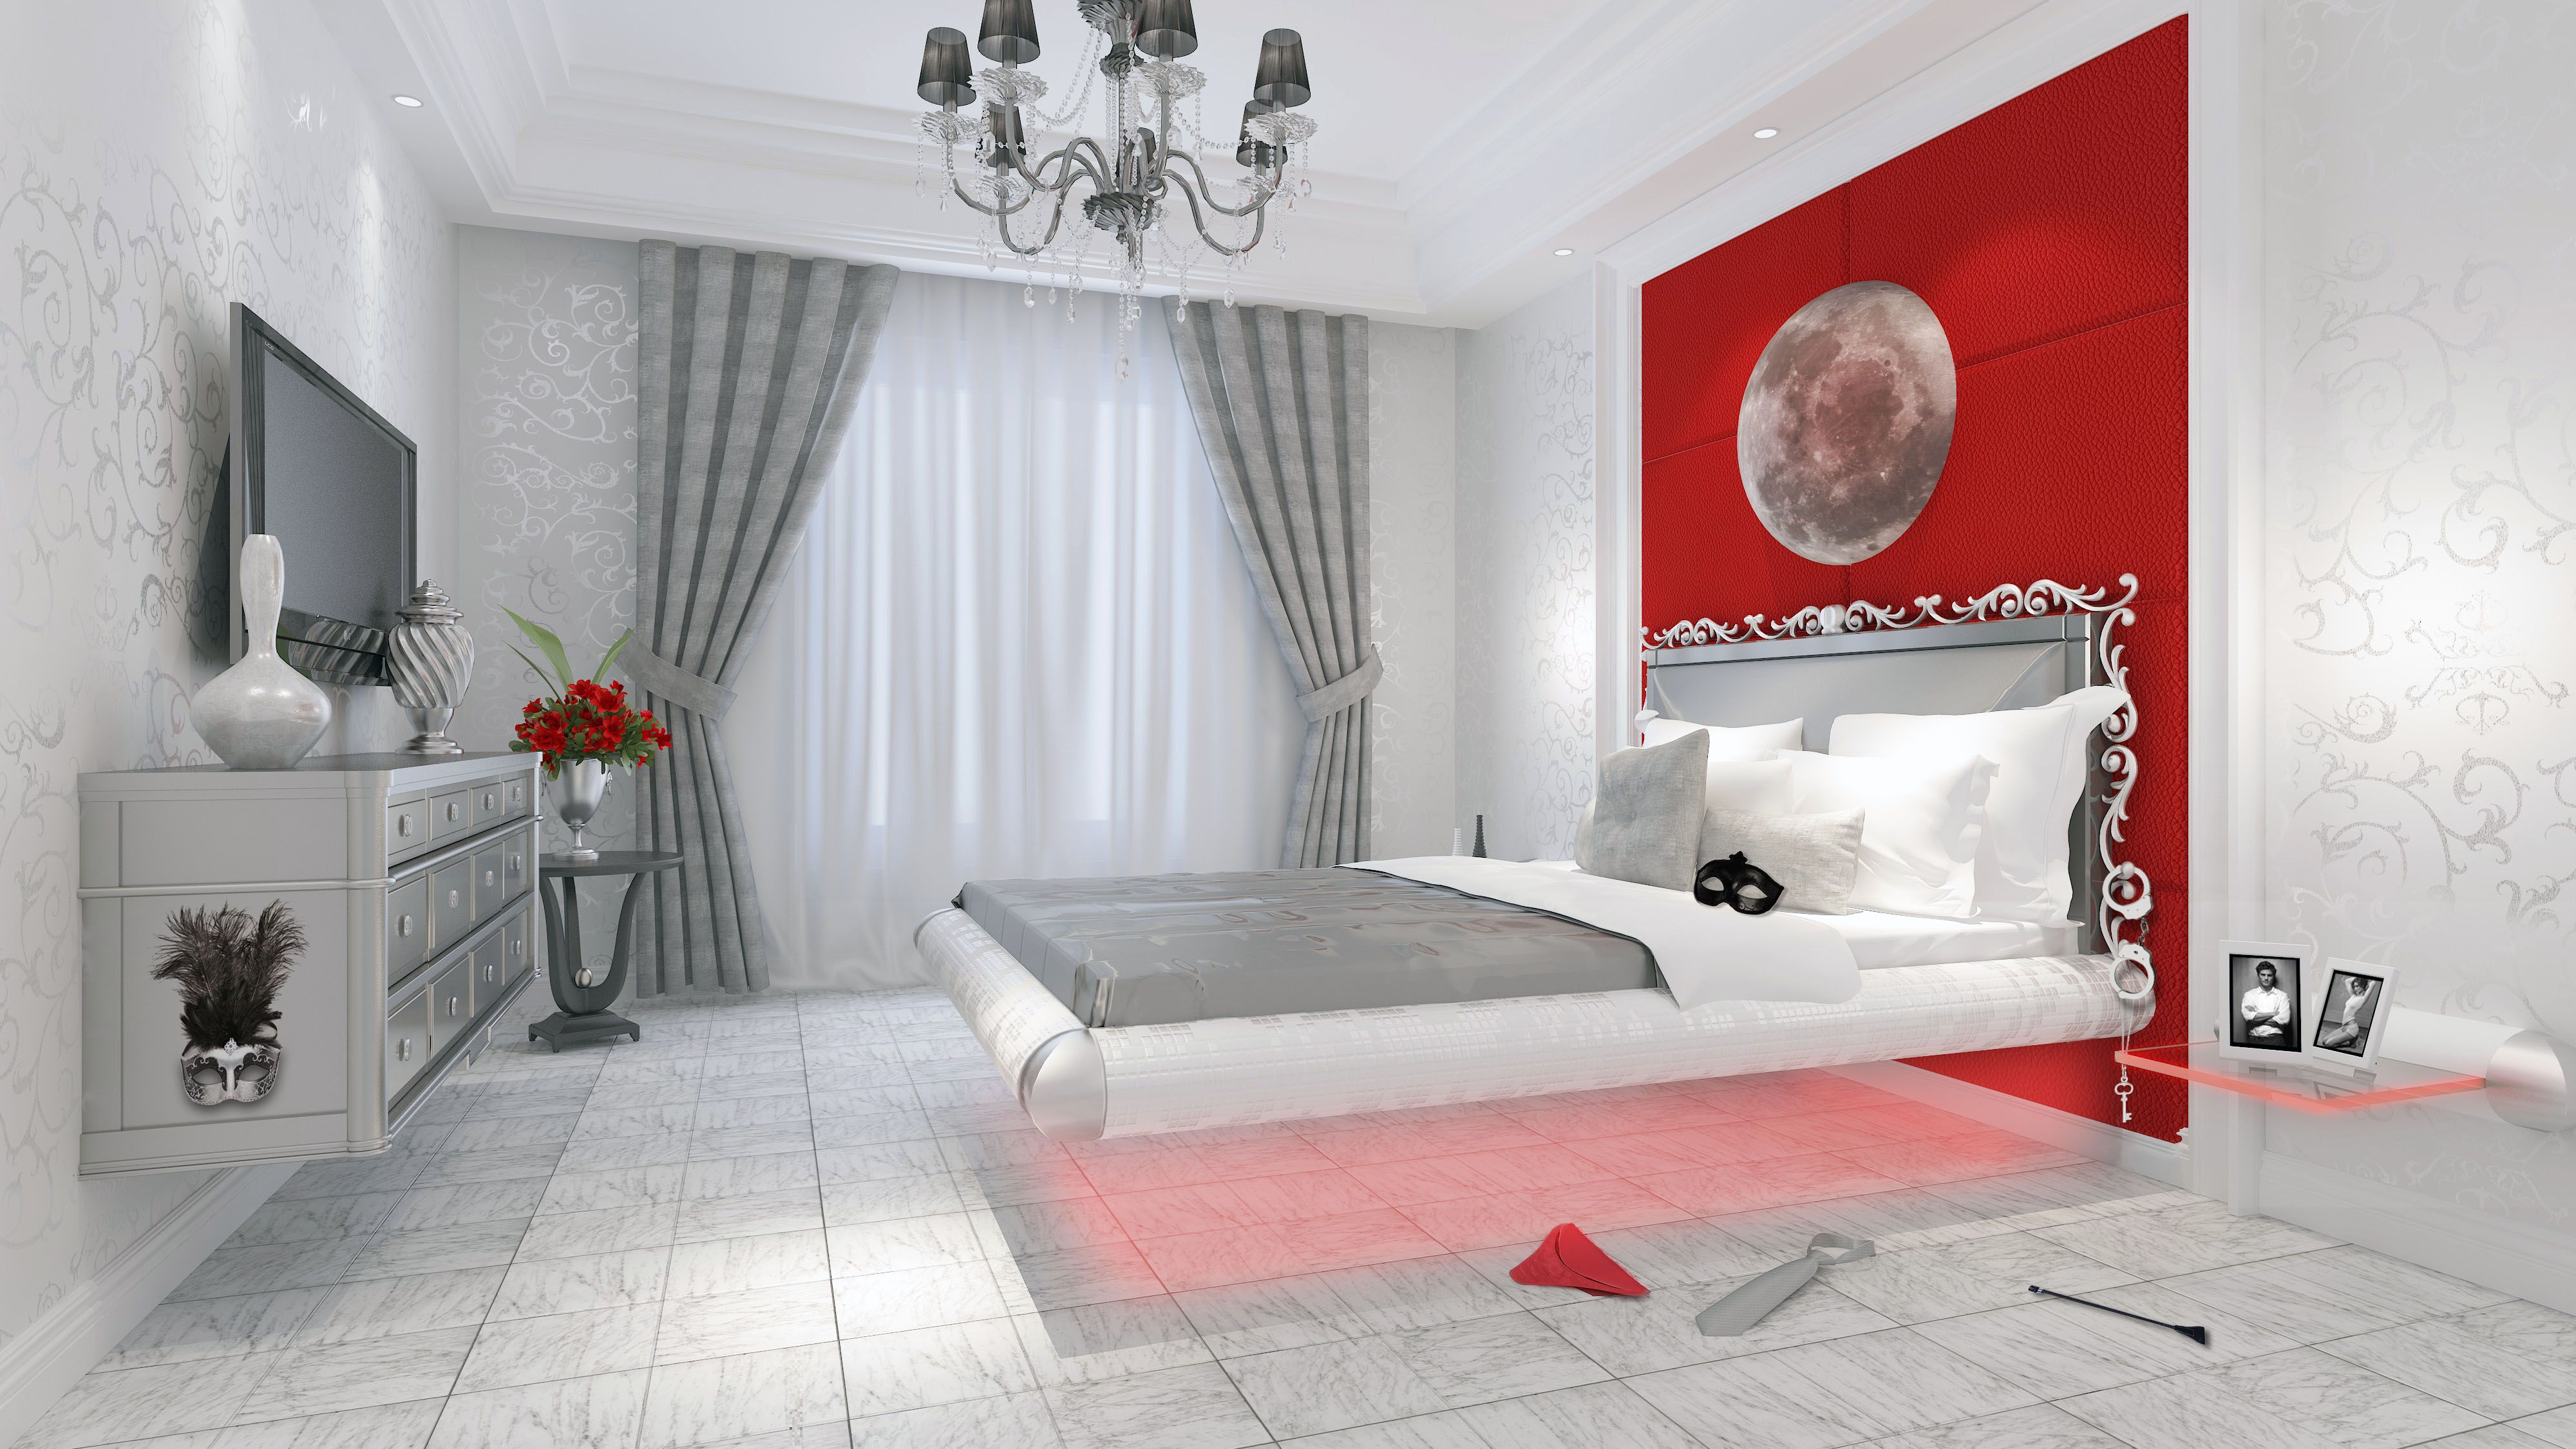 Levitas Design Is A Designer And Retailer Of Modern Furniture